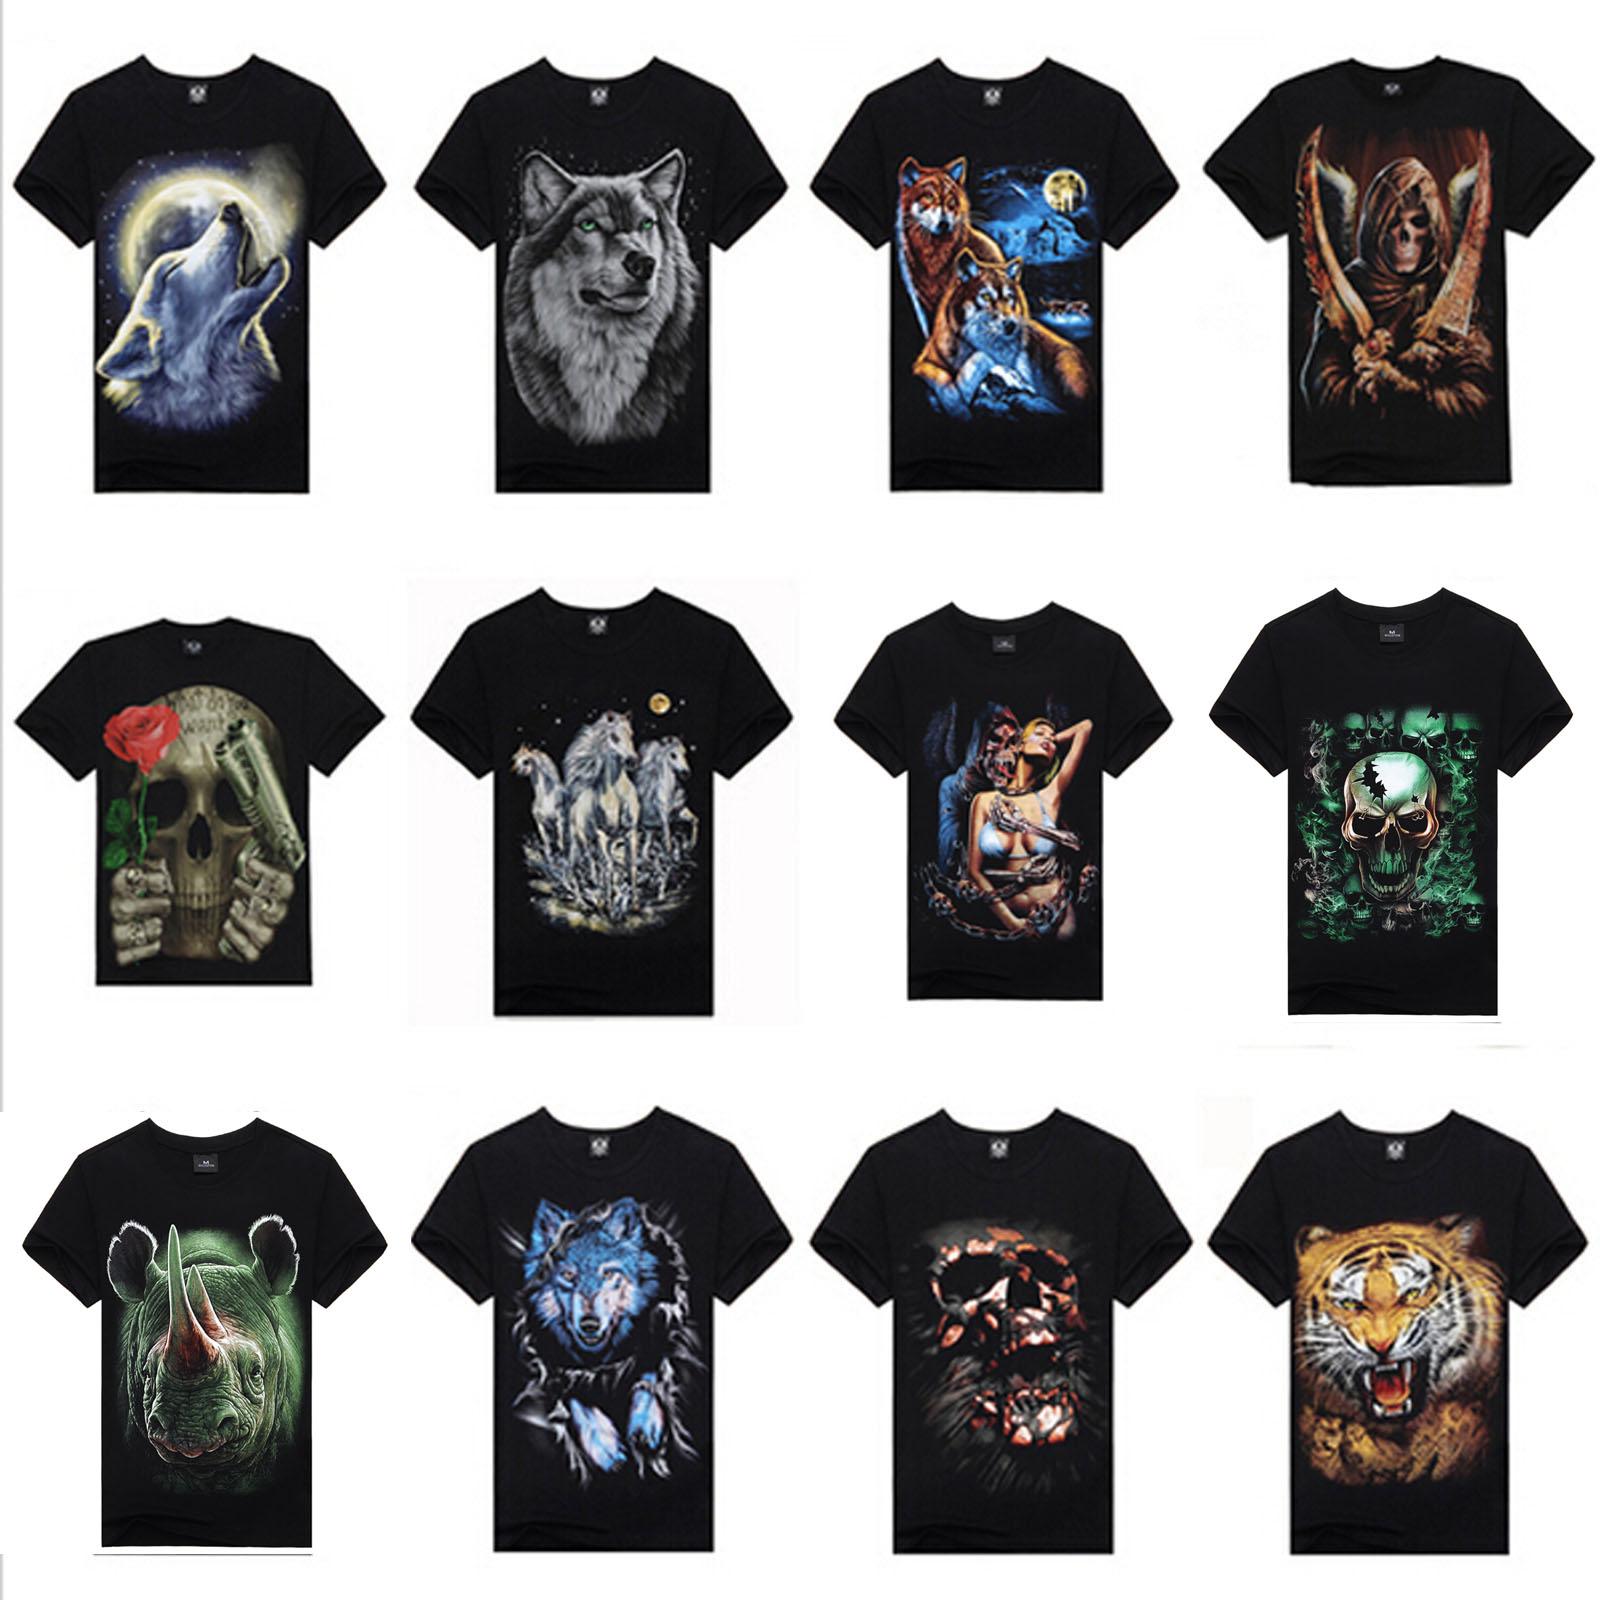 Top Quality 2015 Summer New Brand Men's Cotton Short Sleeve T-shirt Fashion O-Neck Casual Skull Wolf 3d Print T Shirt M-XXXL(China (Mainland))